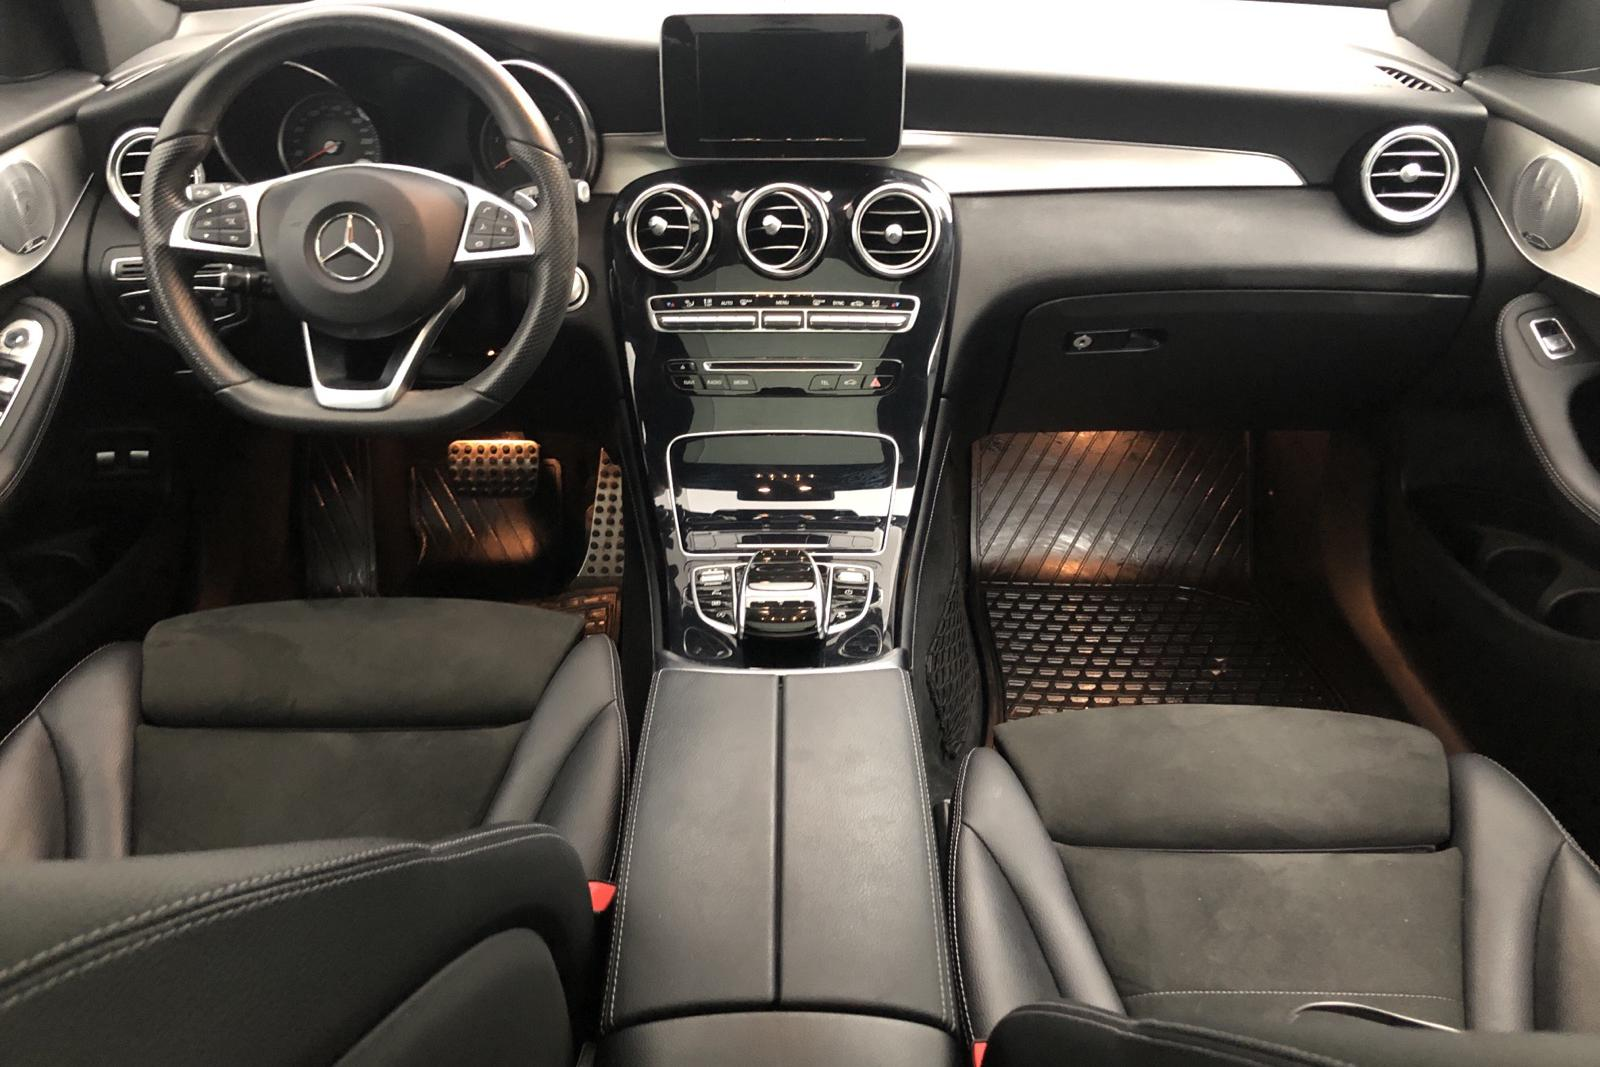 Mercedes GLC 220 d 4MATIC X253 (170hk) - 64 761 km - black - 2018